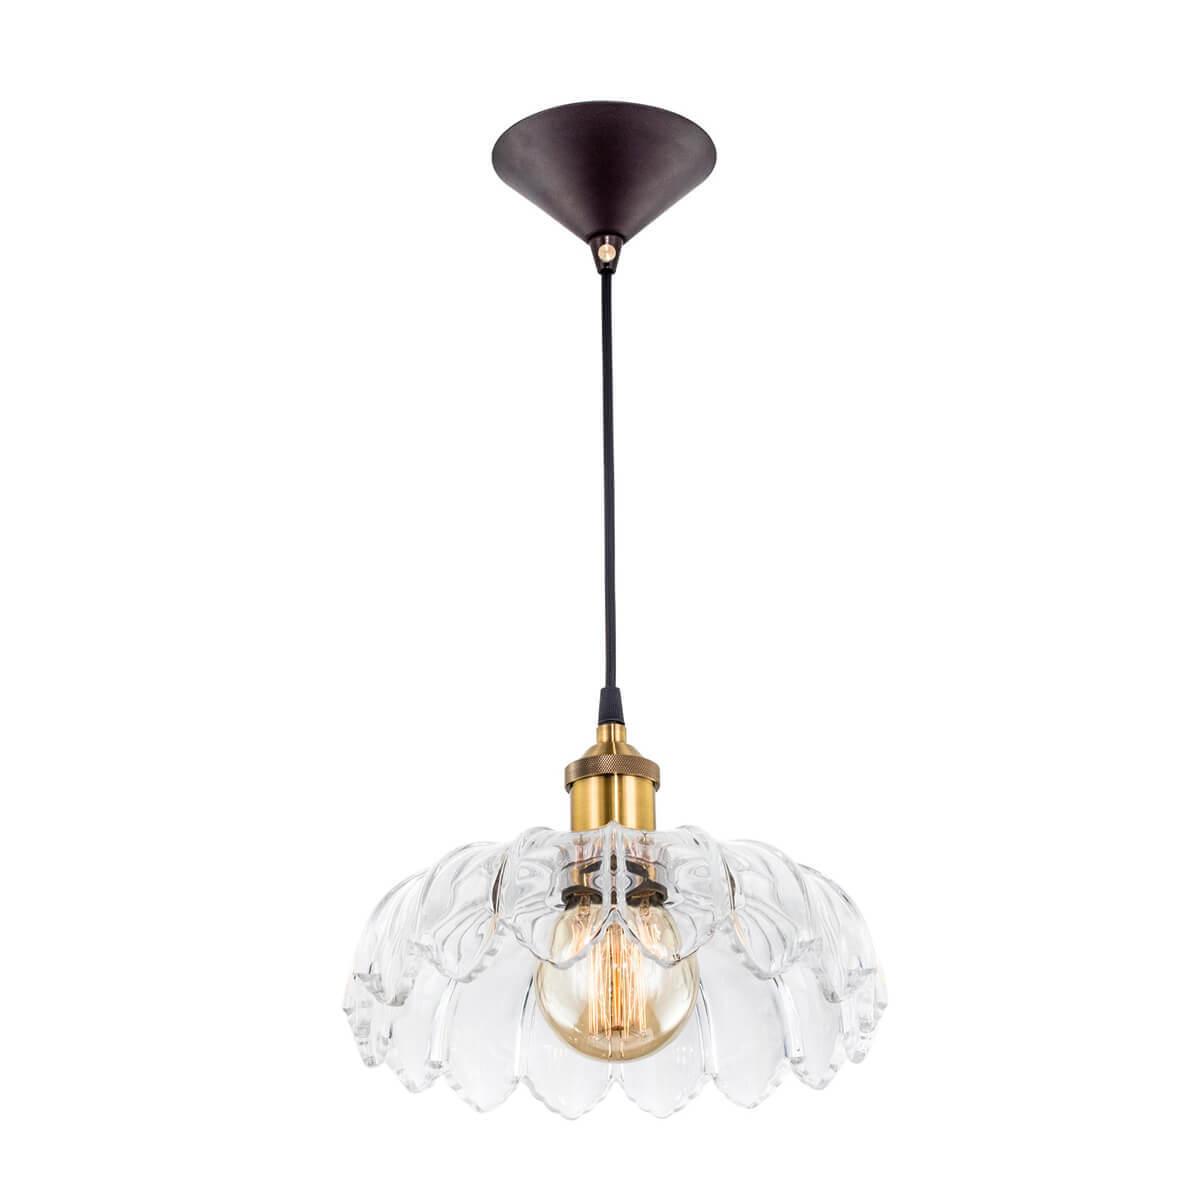 цена на Светильник Citilux CL450107 Эдисон